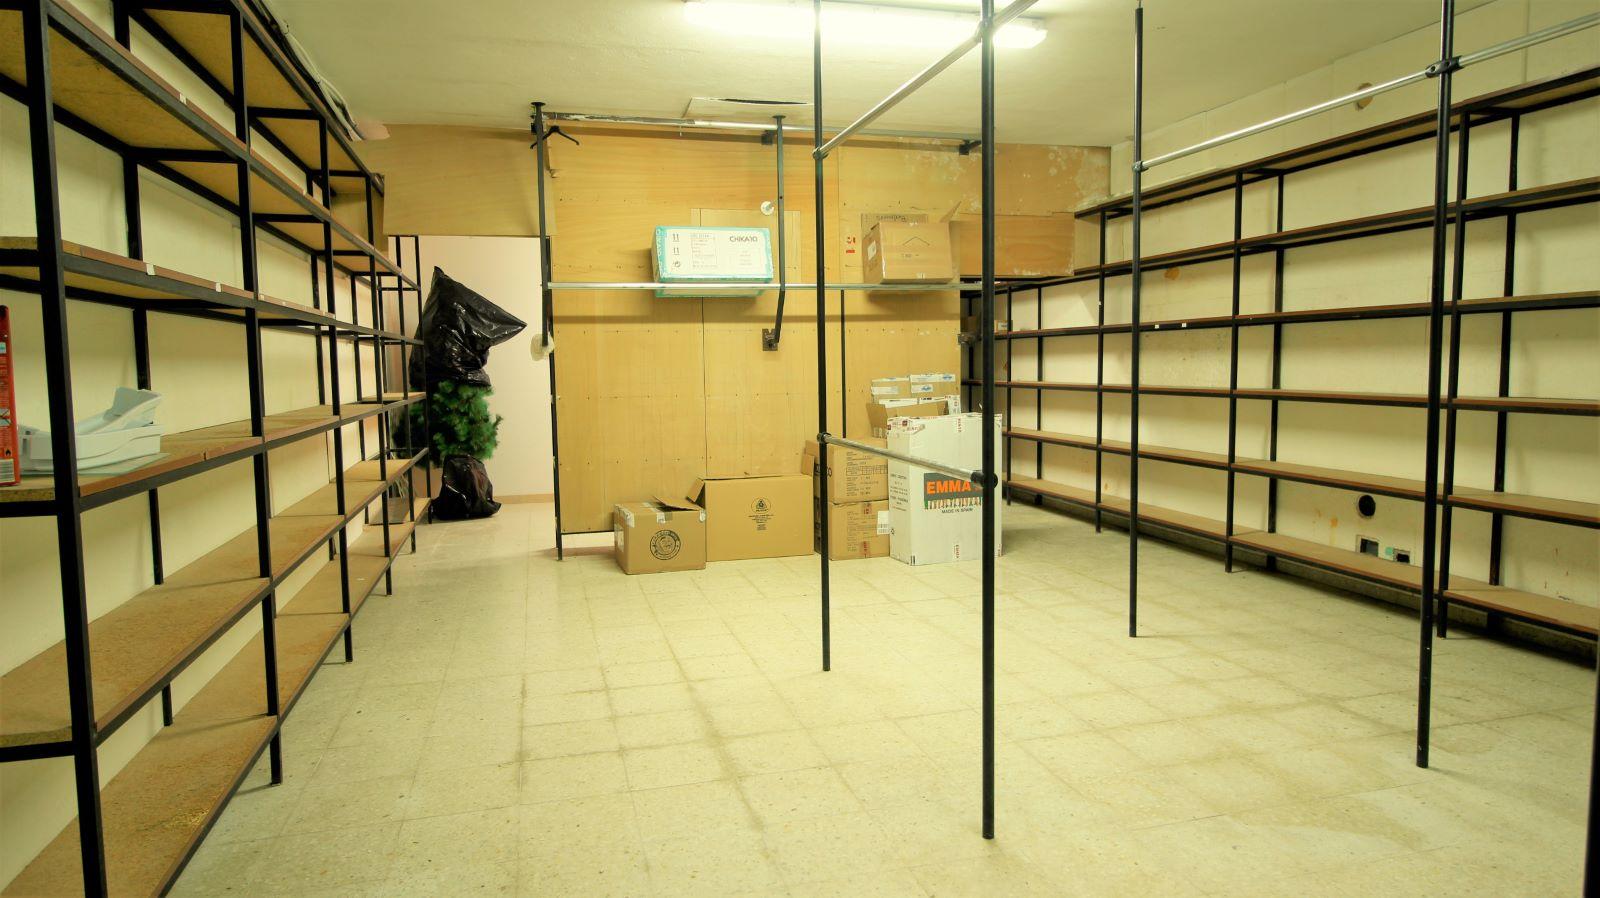 Local comercial en Sant Lluís Ref: S2562 12